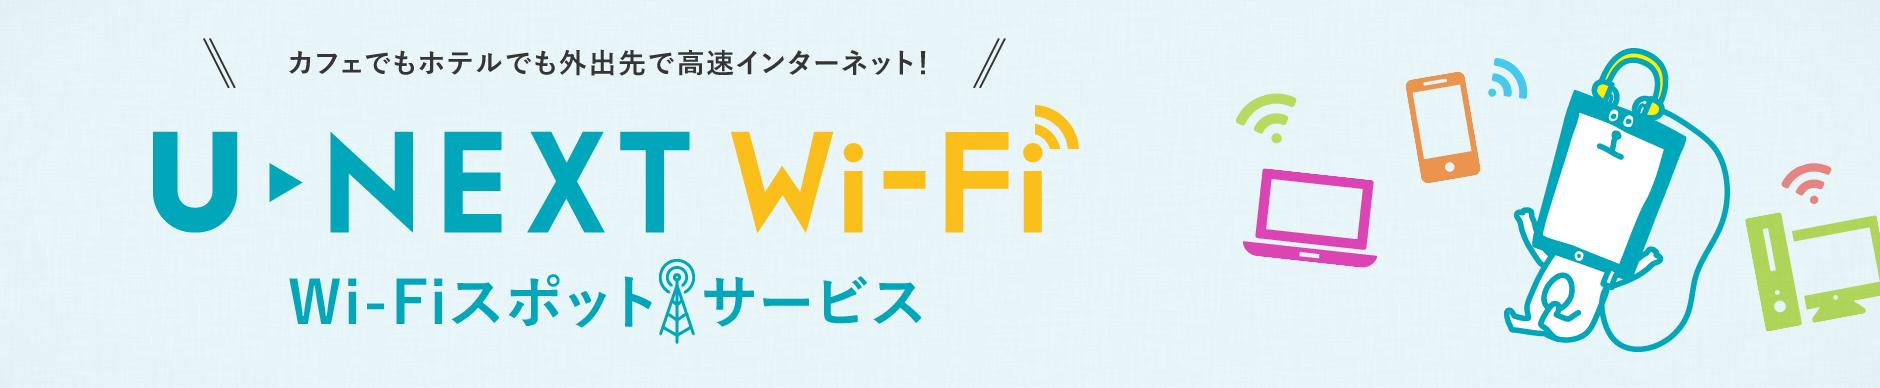 U-NEXT Wi-Fiスポットが拡充、「U-mobile PREMIUM」ユーザーも利用可能に